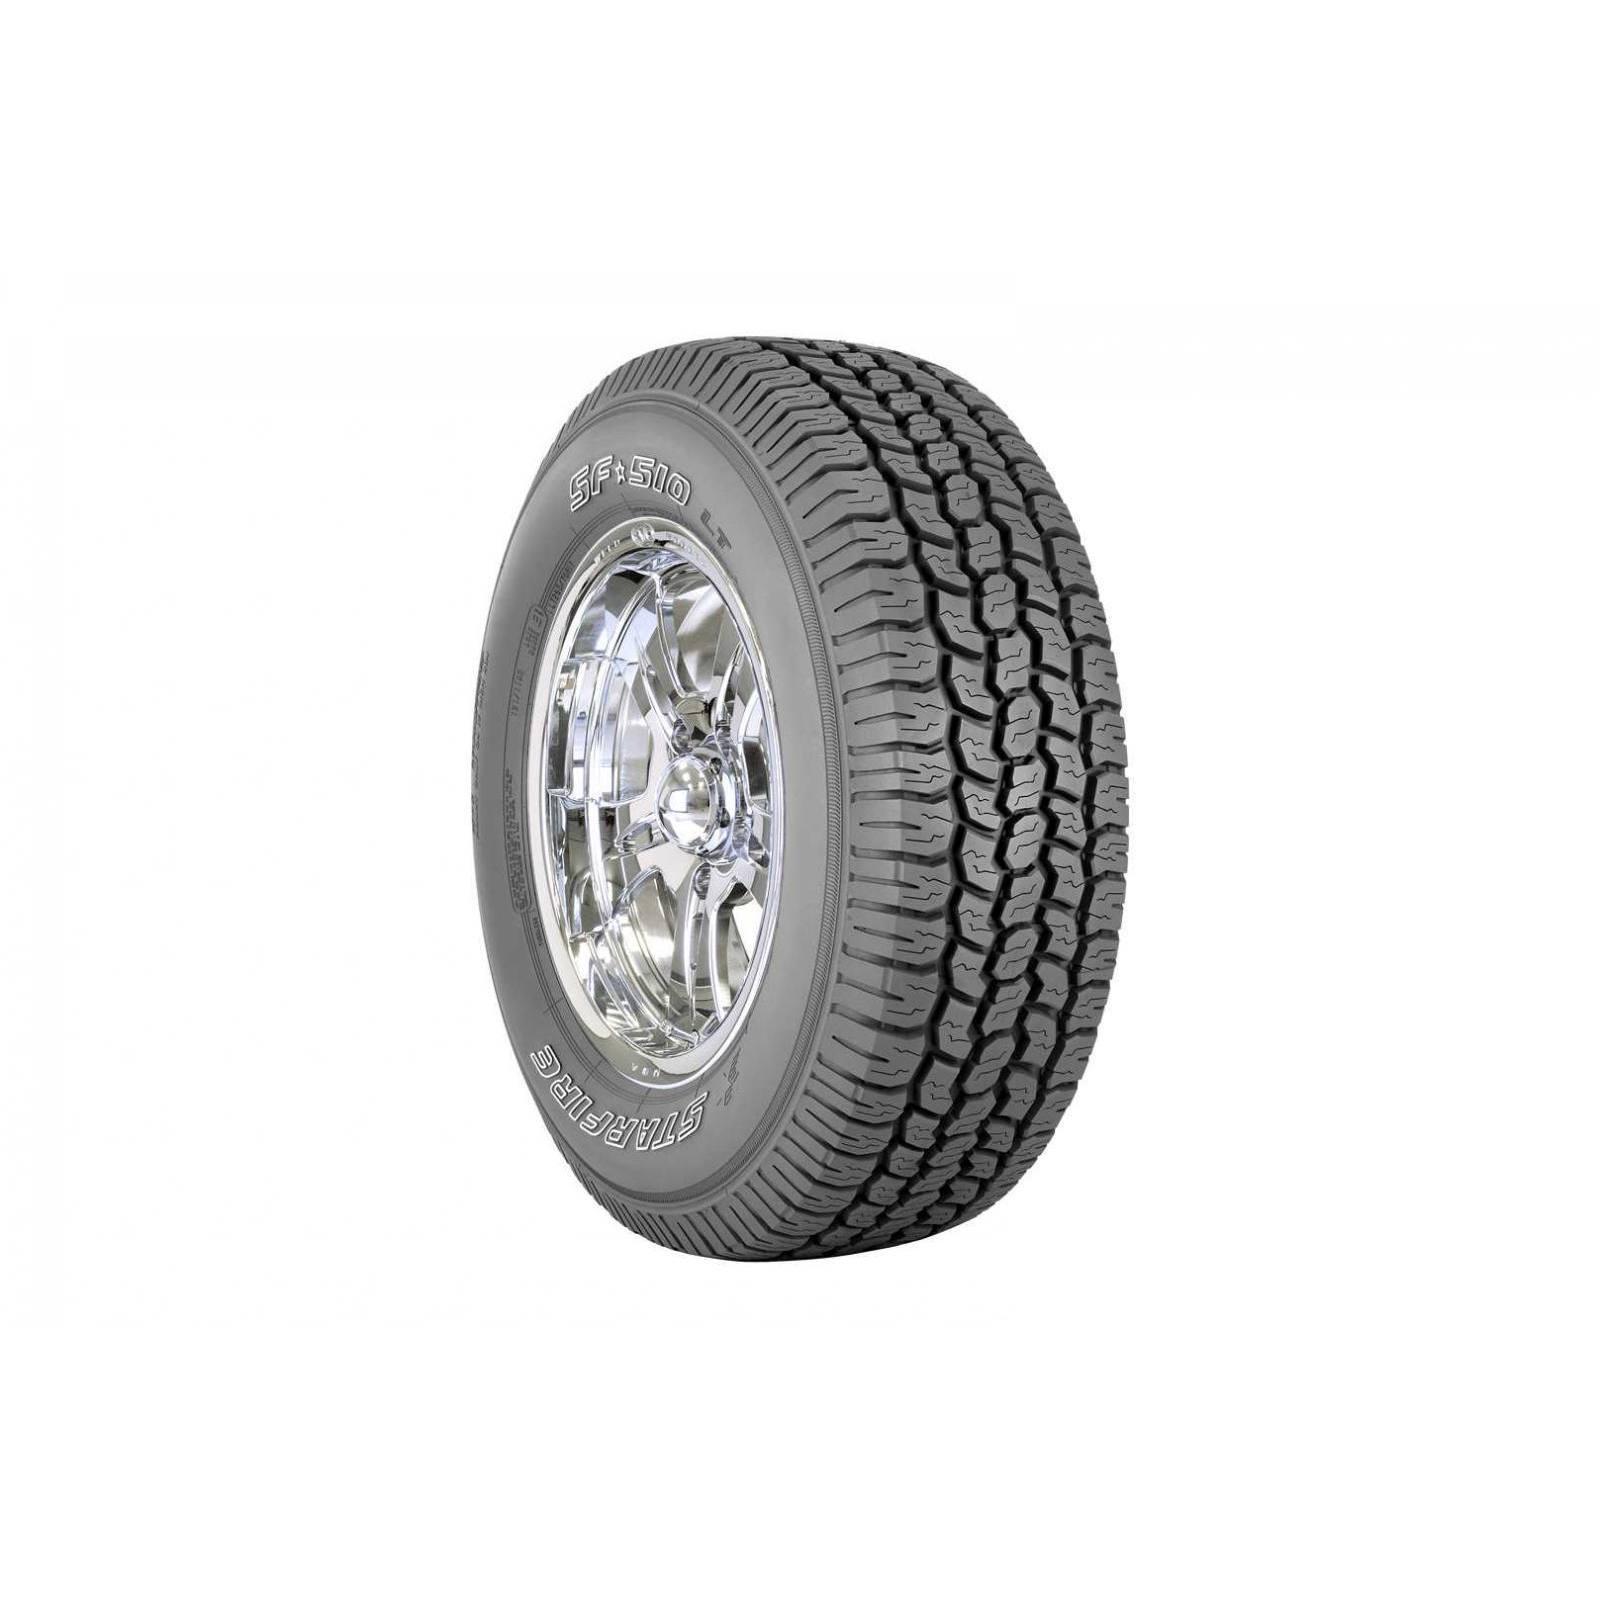 Starfire SF-510 All Season Tire - 245/70R16 107S (Black)